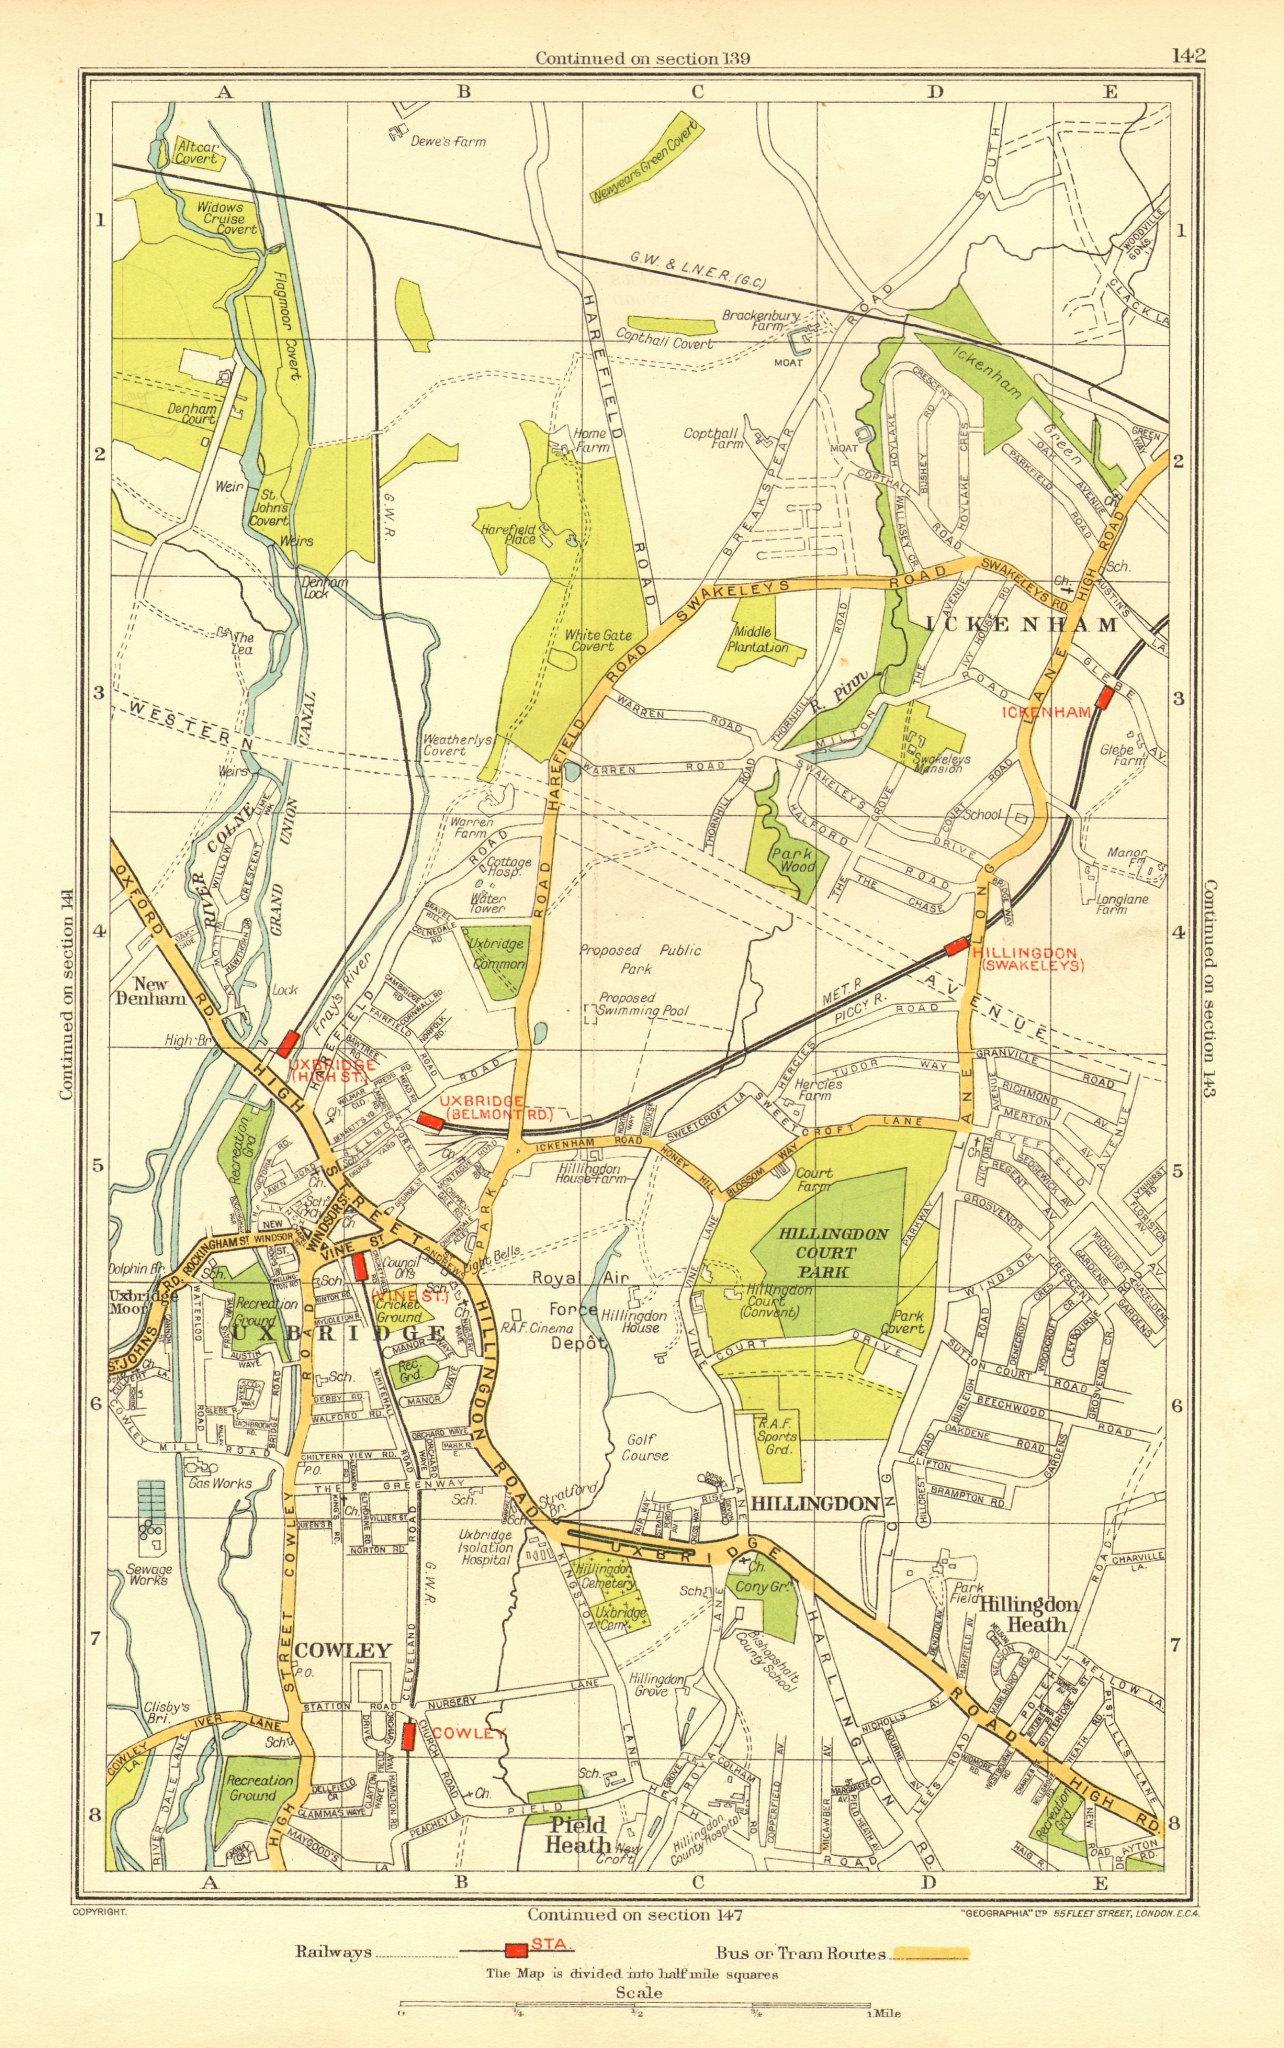 Associate Product UXBRIDGE. Ickenham Hillingdon Ruislip Cowley New Denham 1937 old vintage map